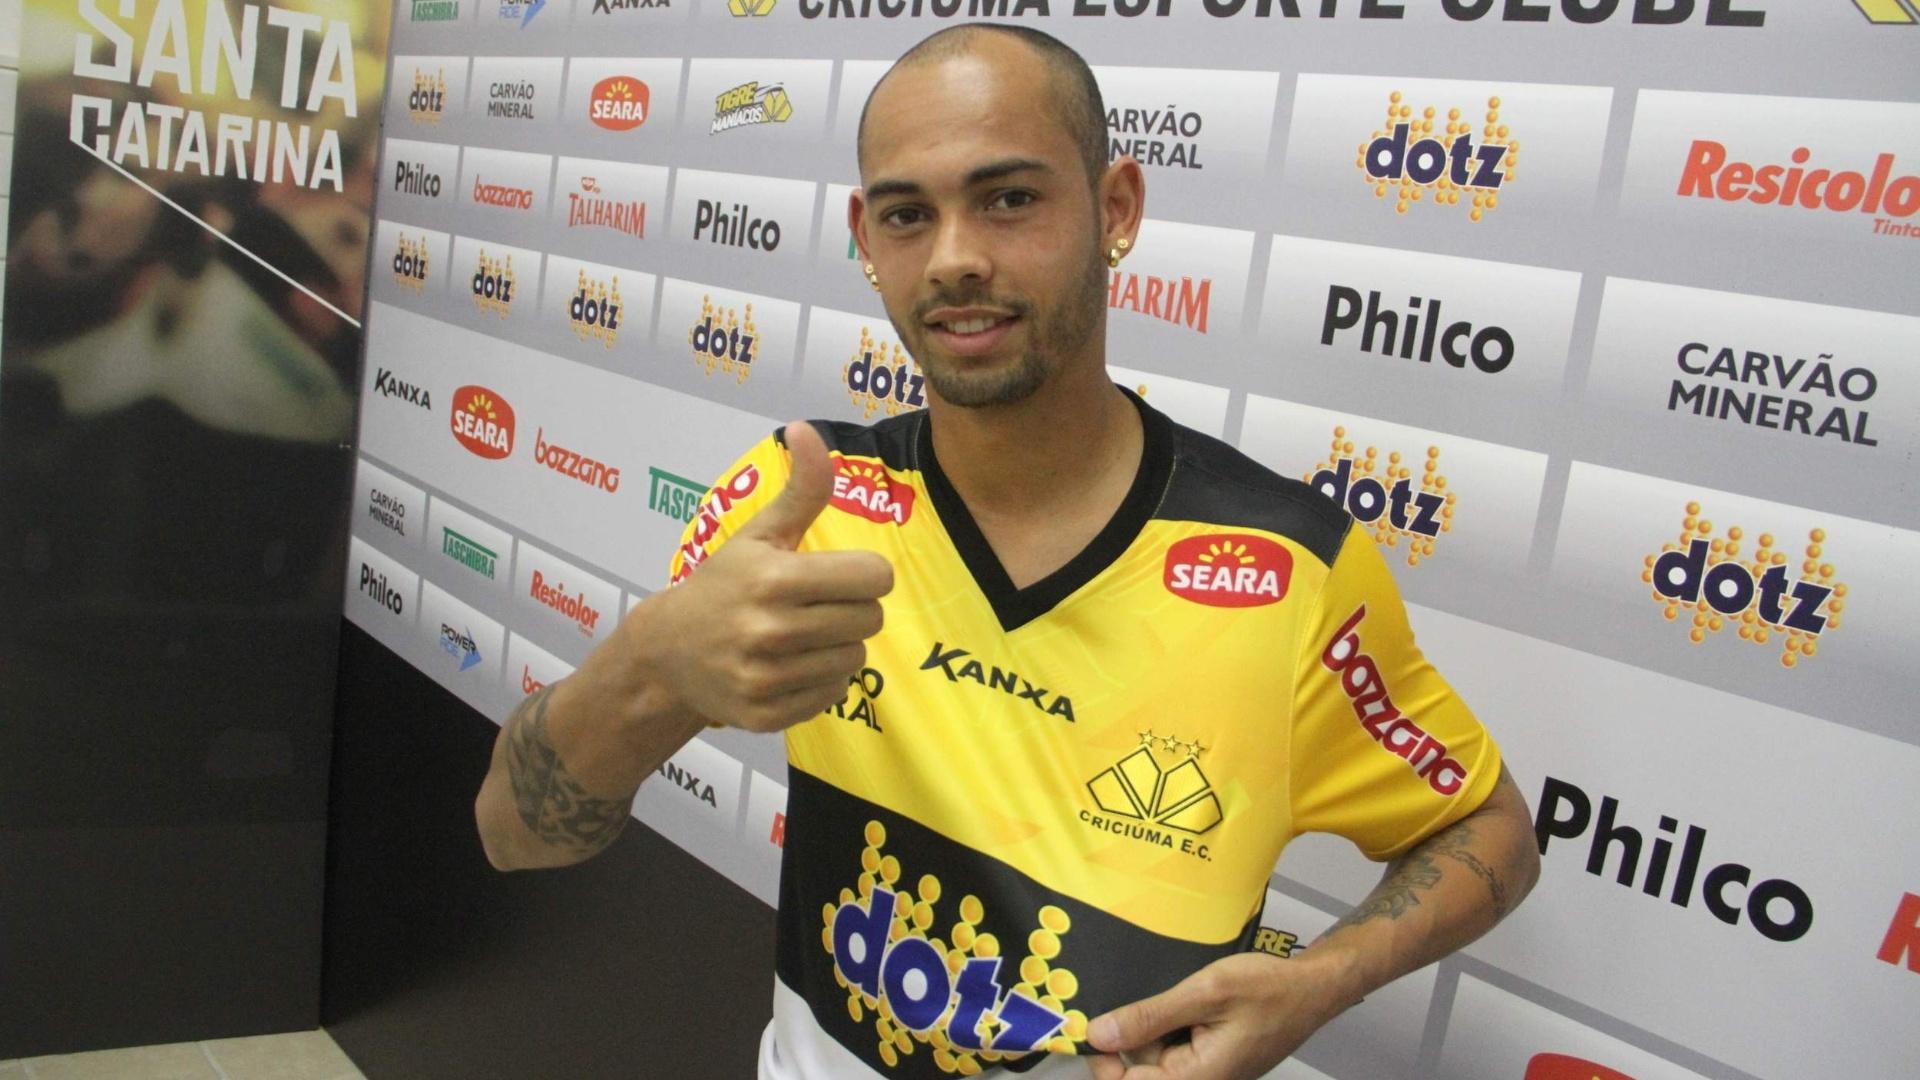 O atacante Danilo Alves faz sinal de positivo ao ser apresentado como jogador do Criciúma